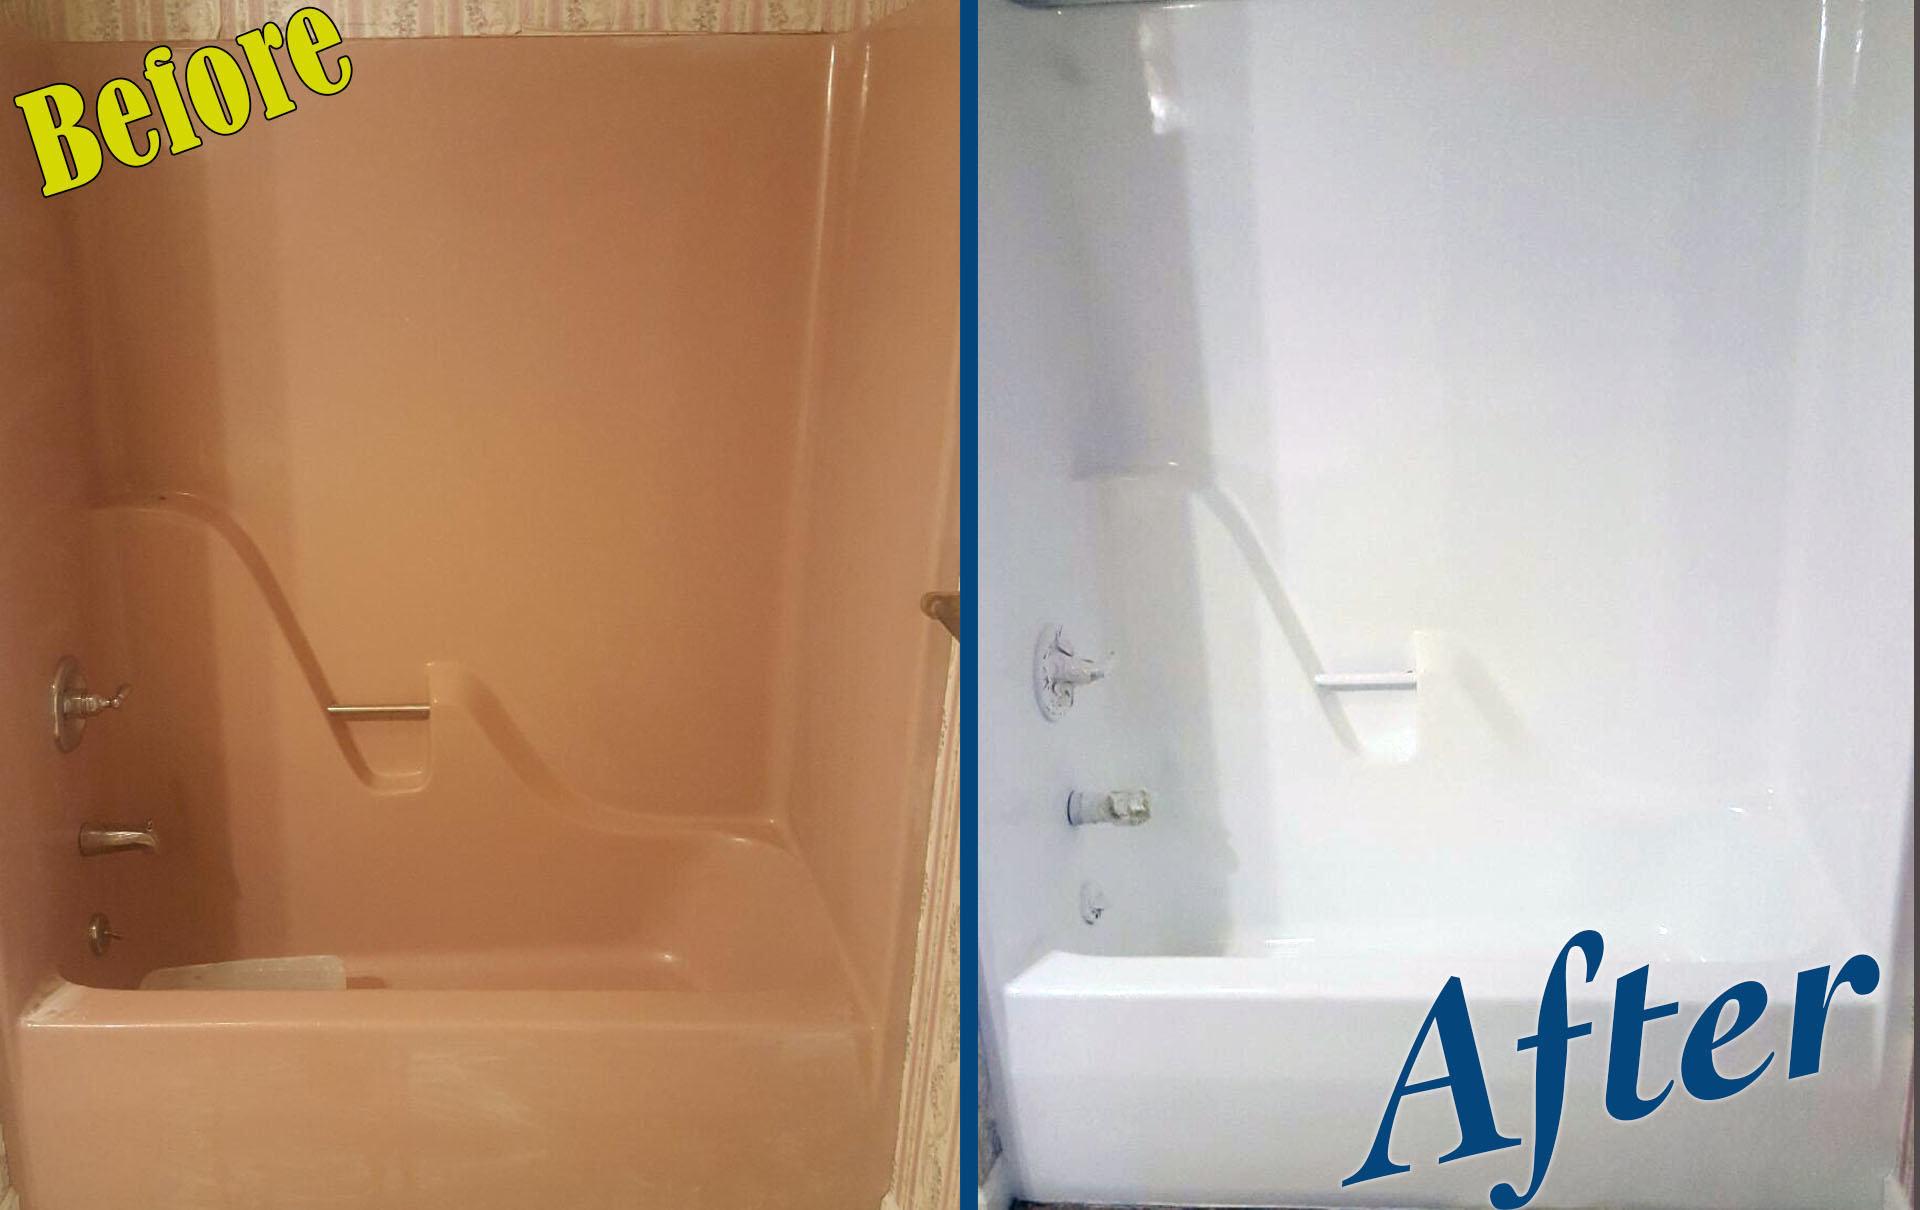 Bathtub Refinishing Pro Charlotte - 22 years Experience - 704-275-9511